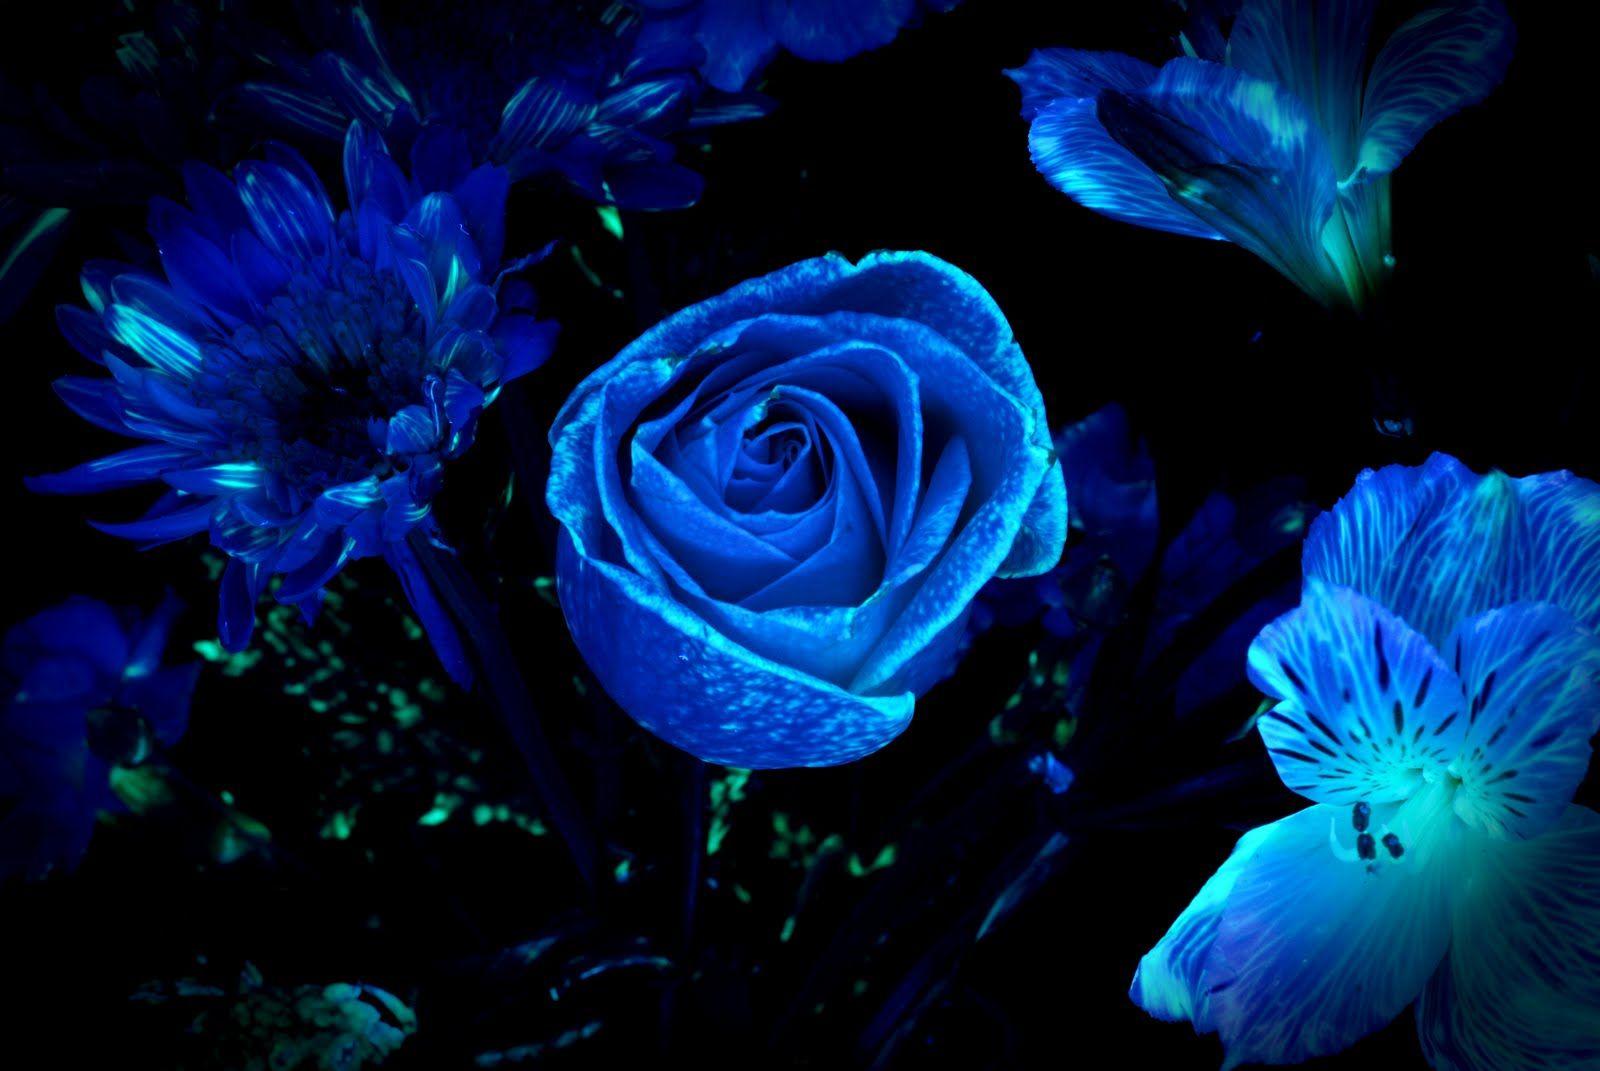 Dark Flower was the pop duo of Melanie Williams and Joe